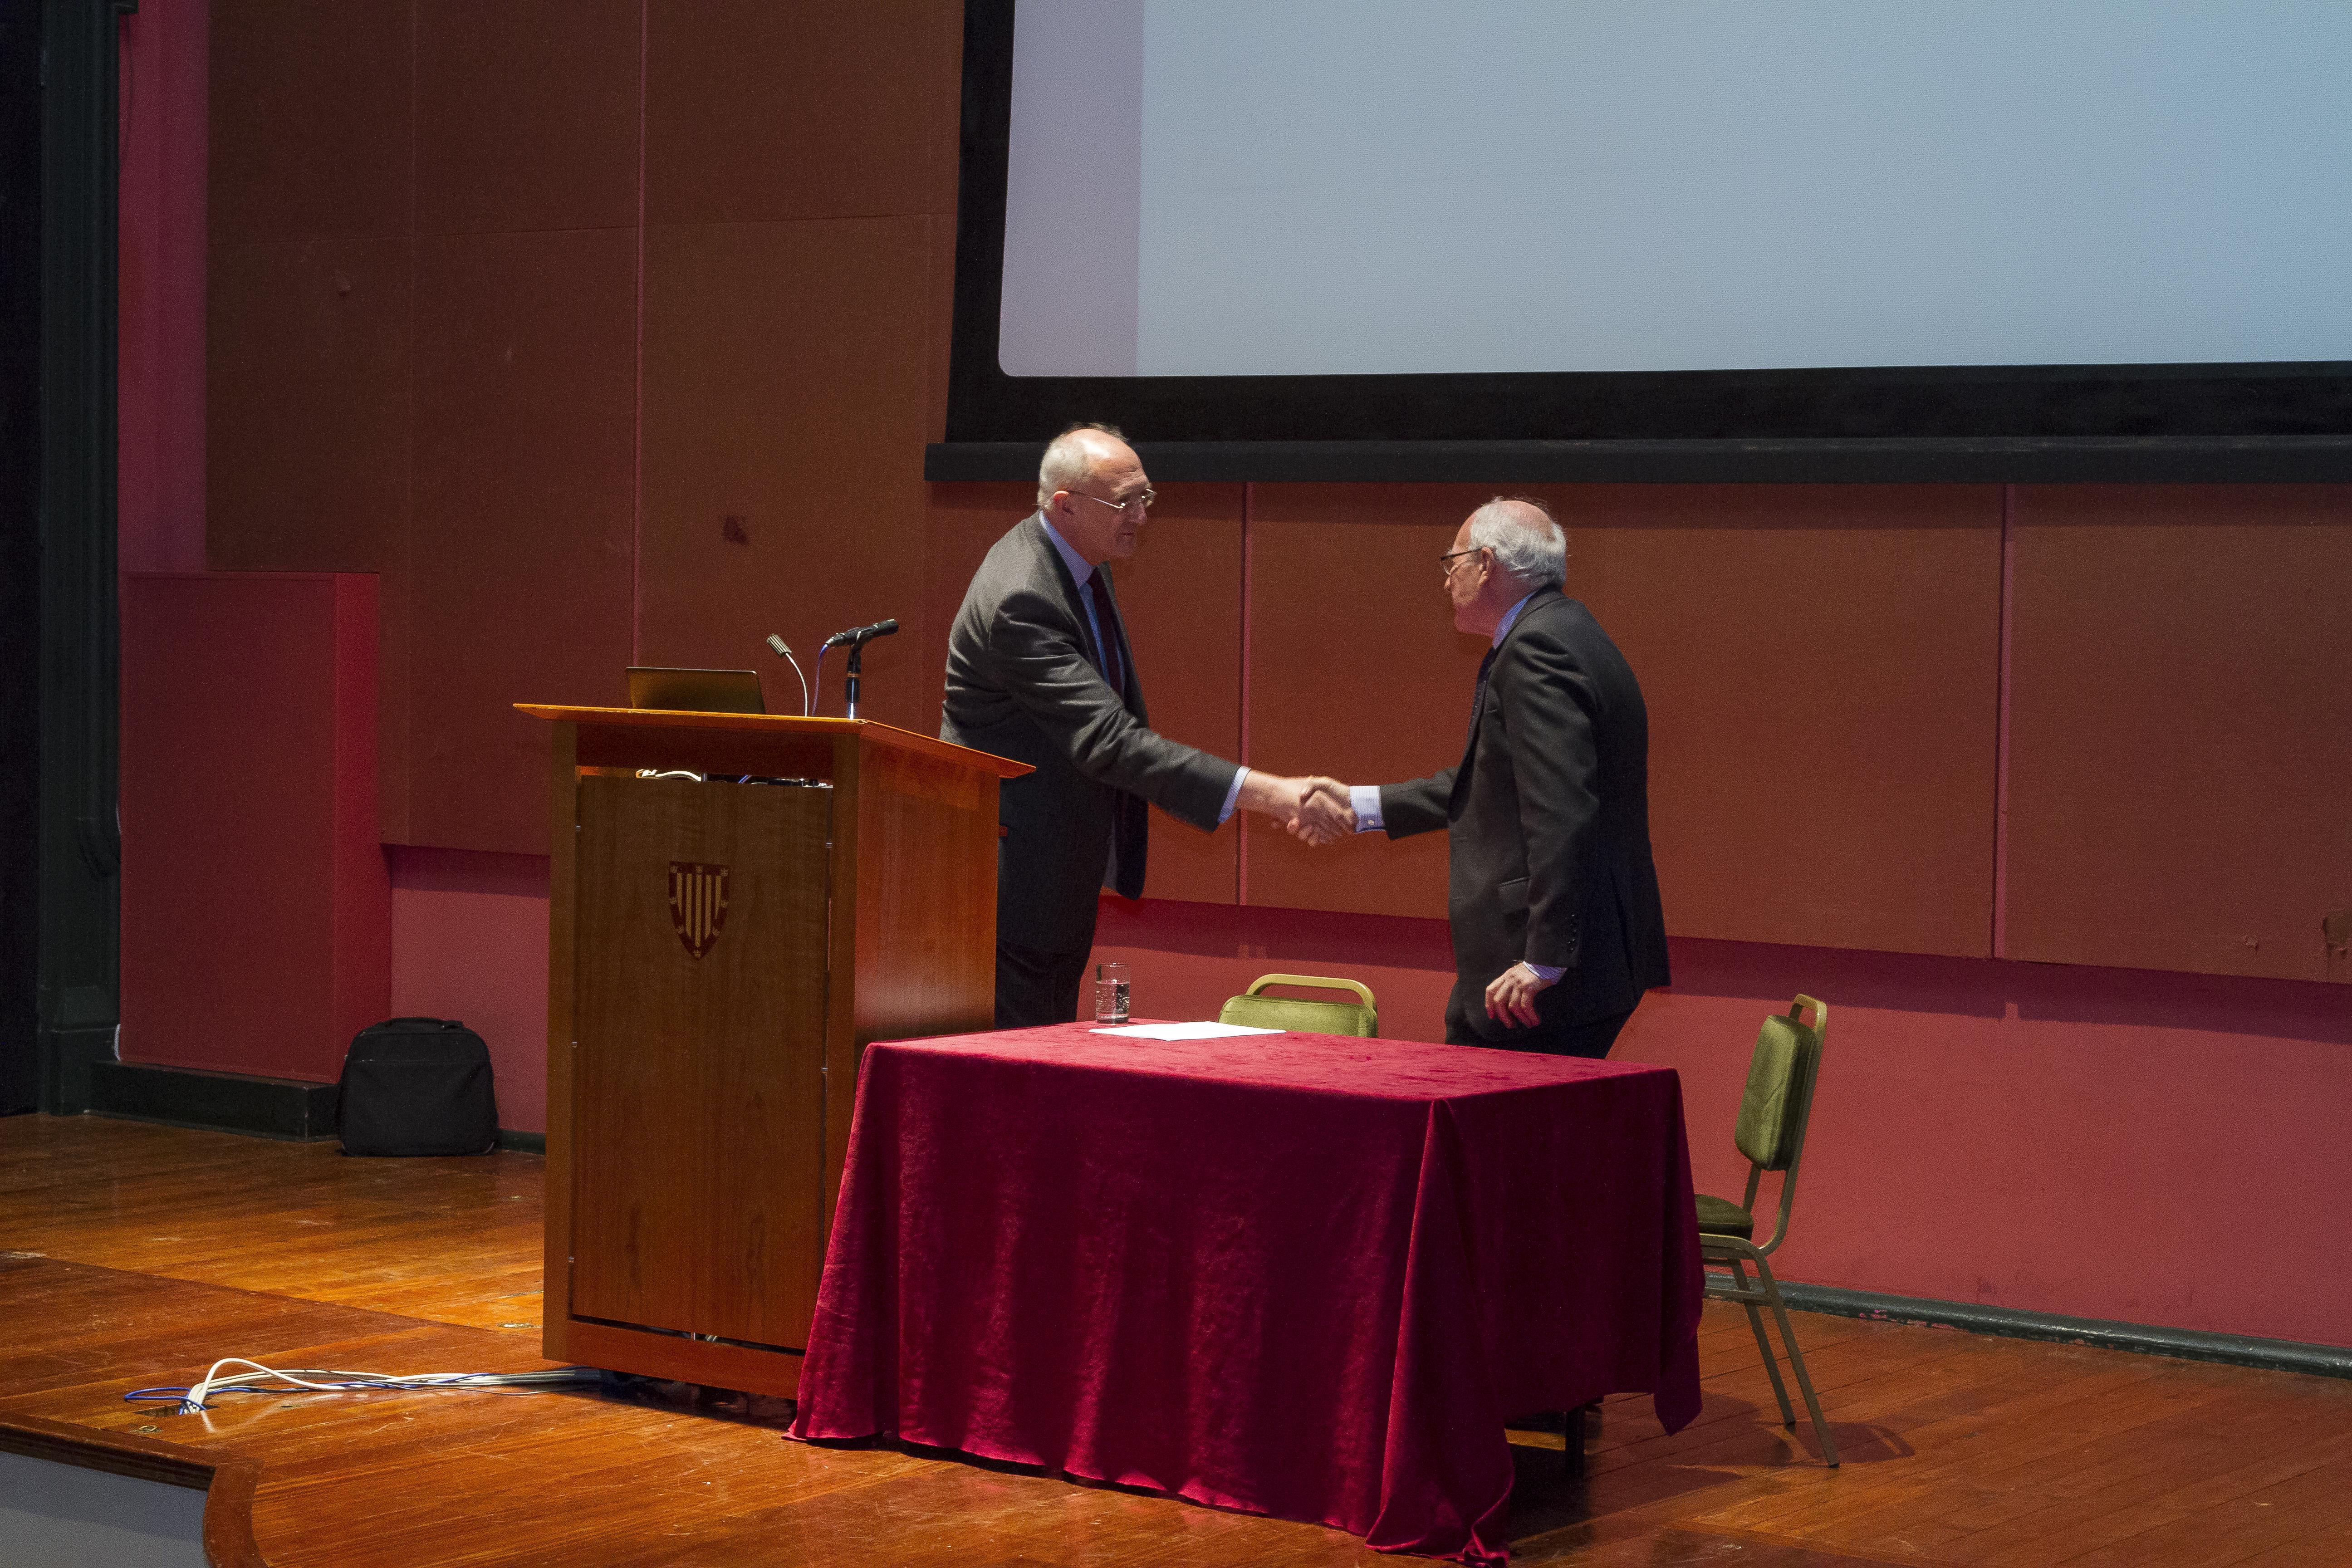 Professor Sir Leszek Borysiewicz & Professor Sir Michael Rutter